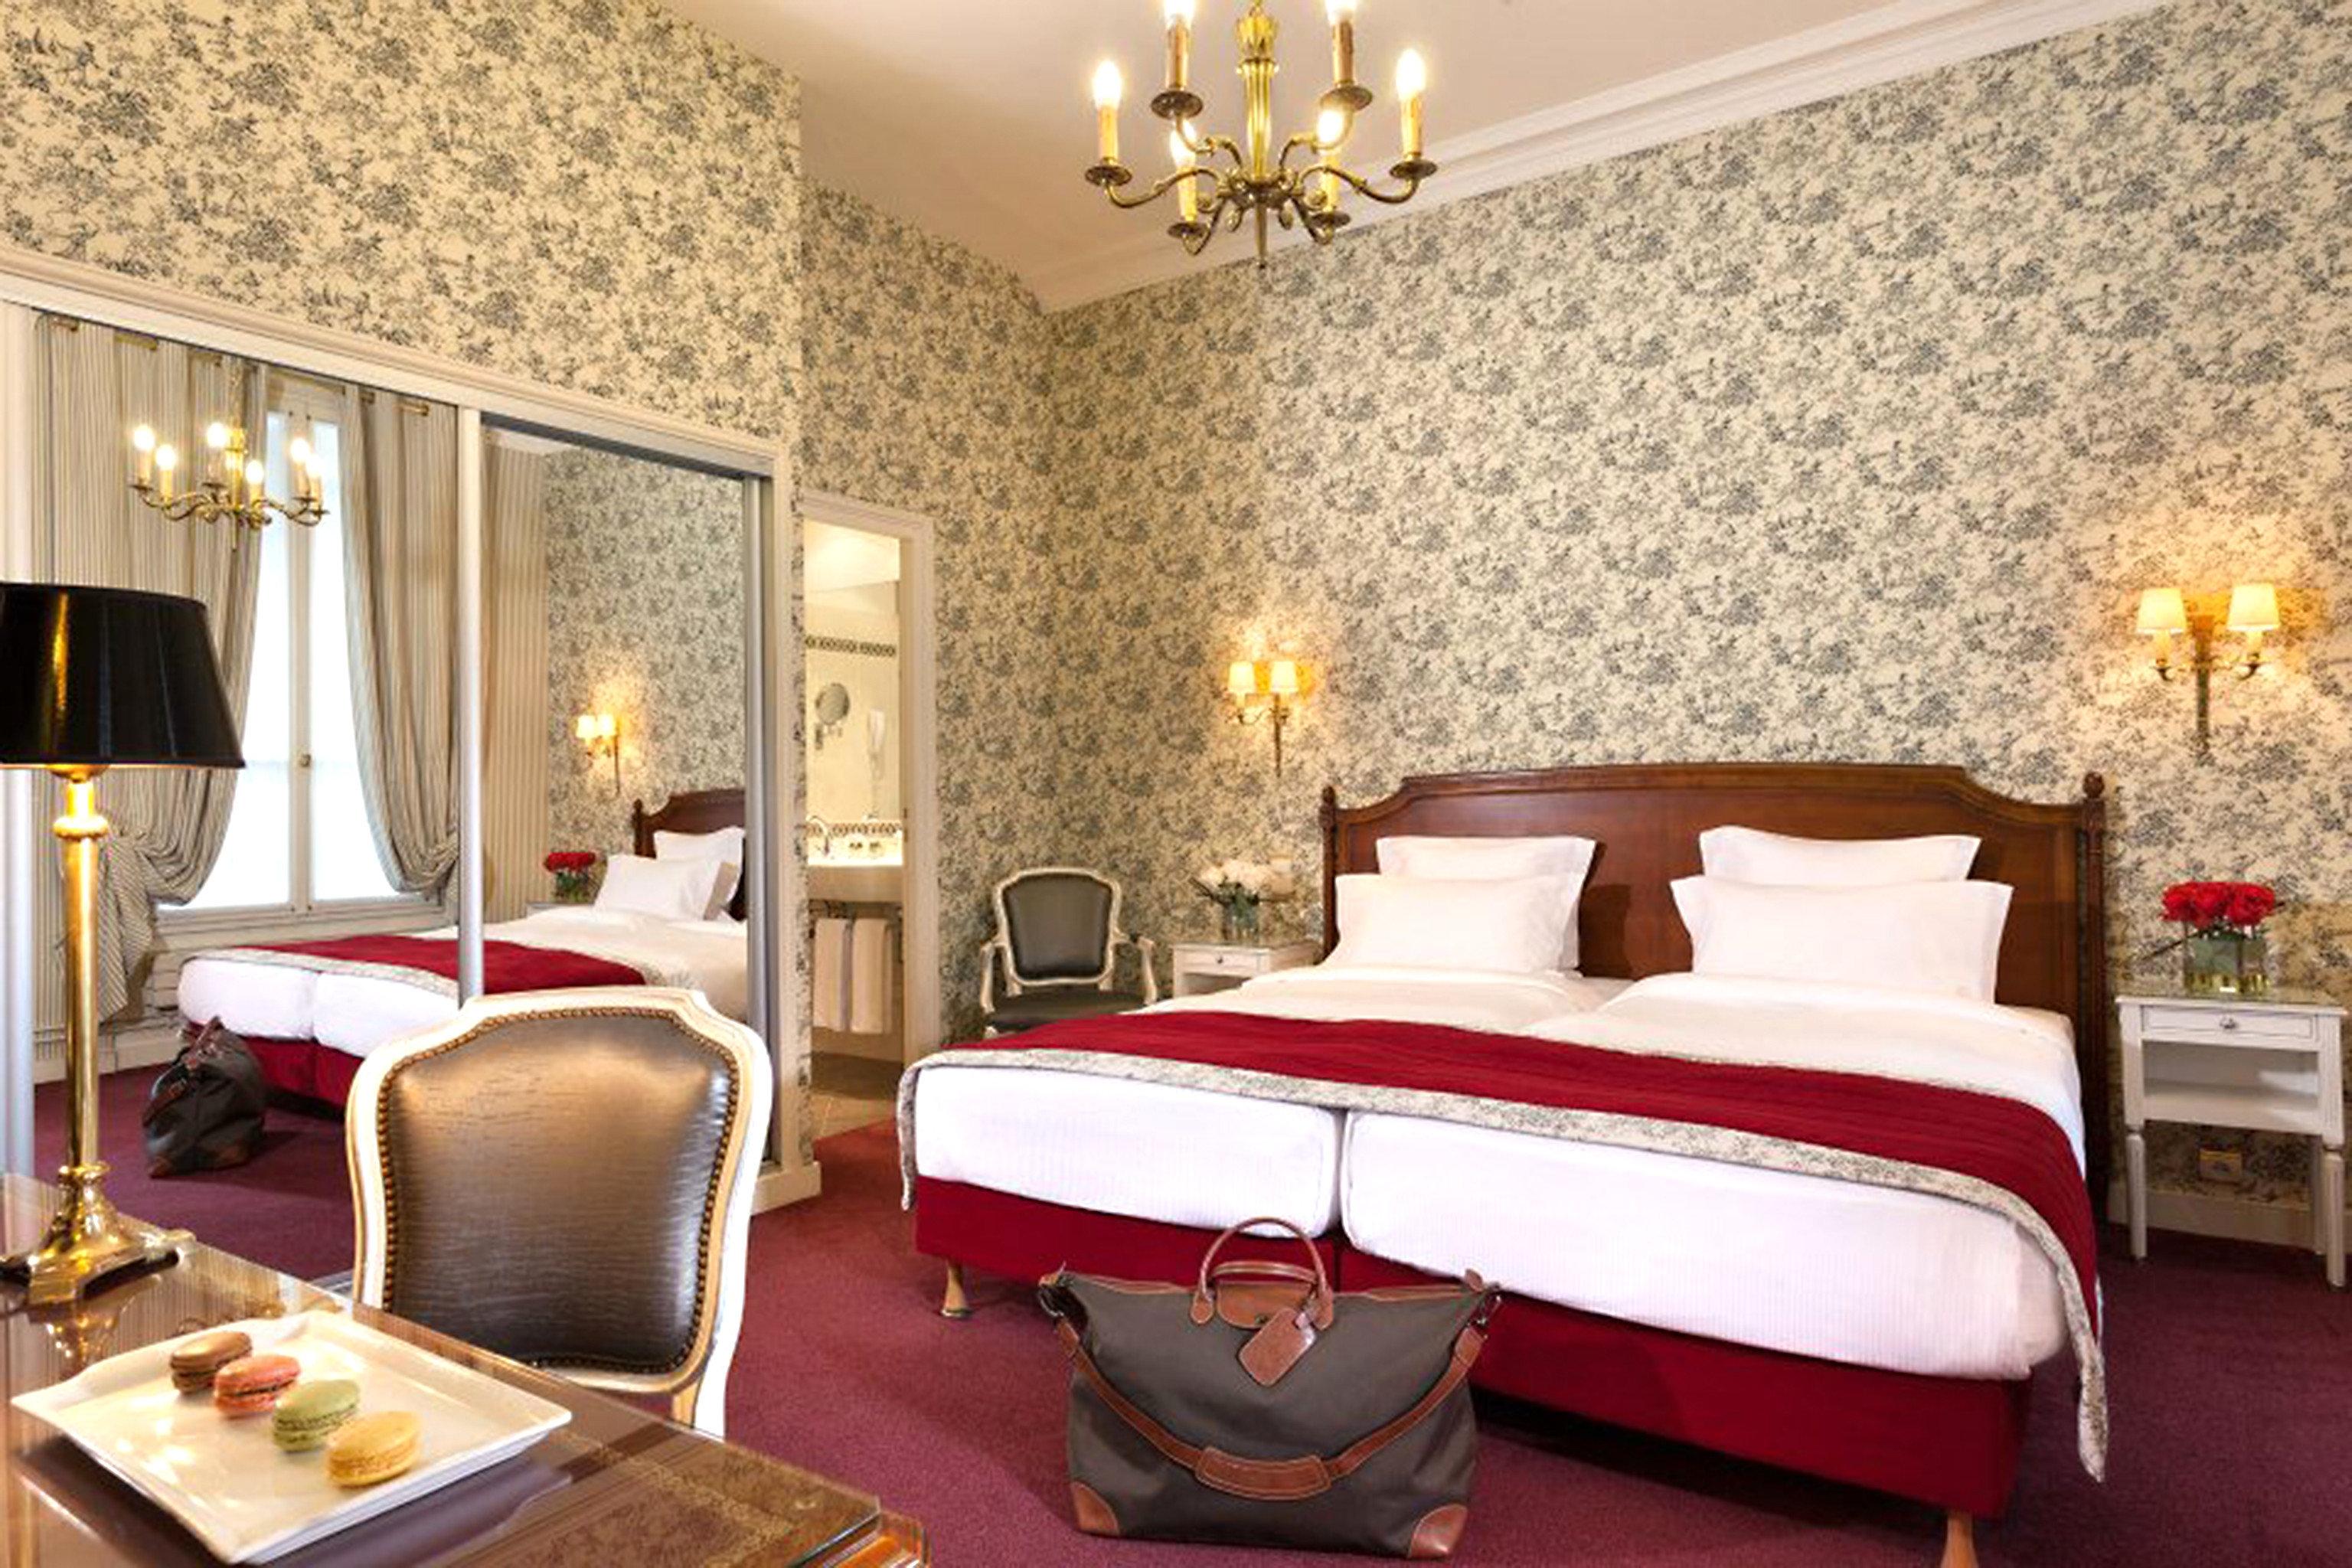 Bedroom Hip Historic Luxury Modern Rustic Suite property bed sheet living room